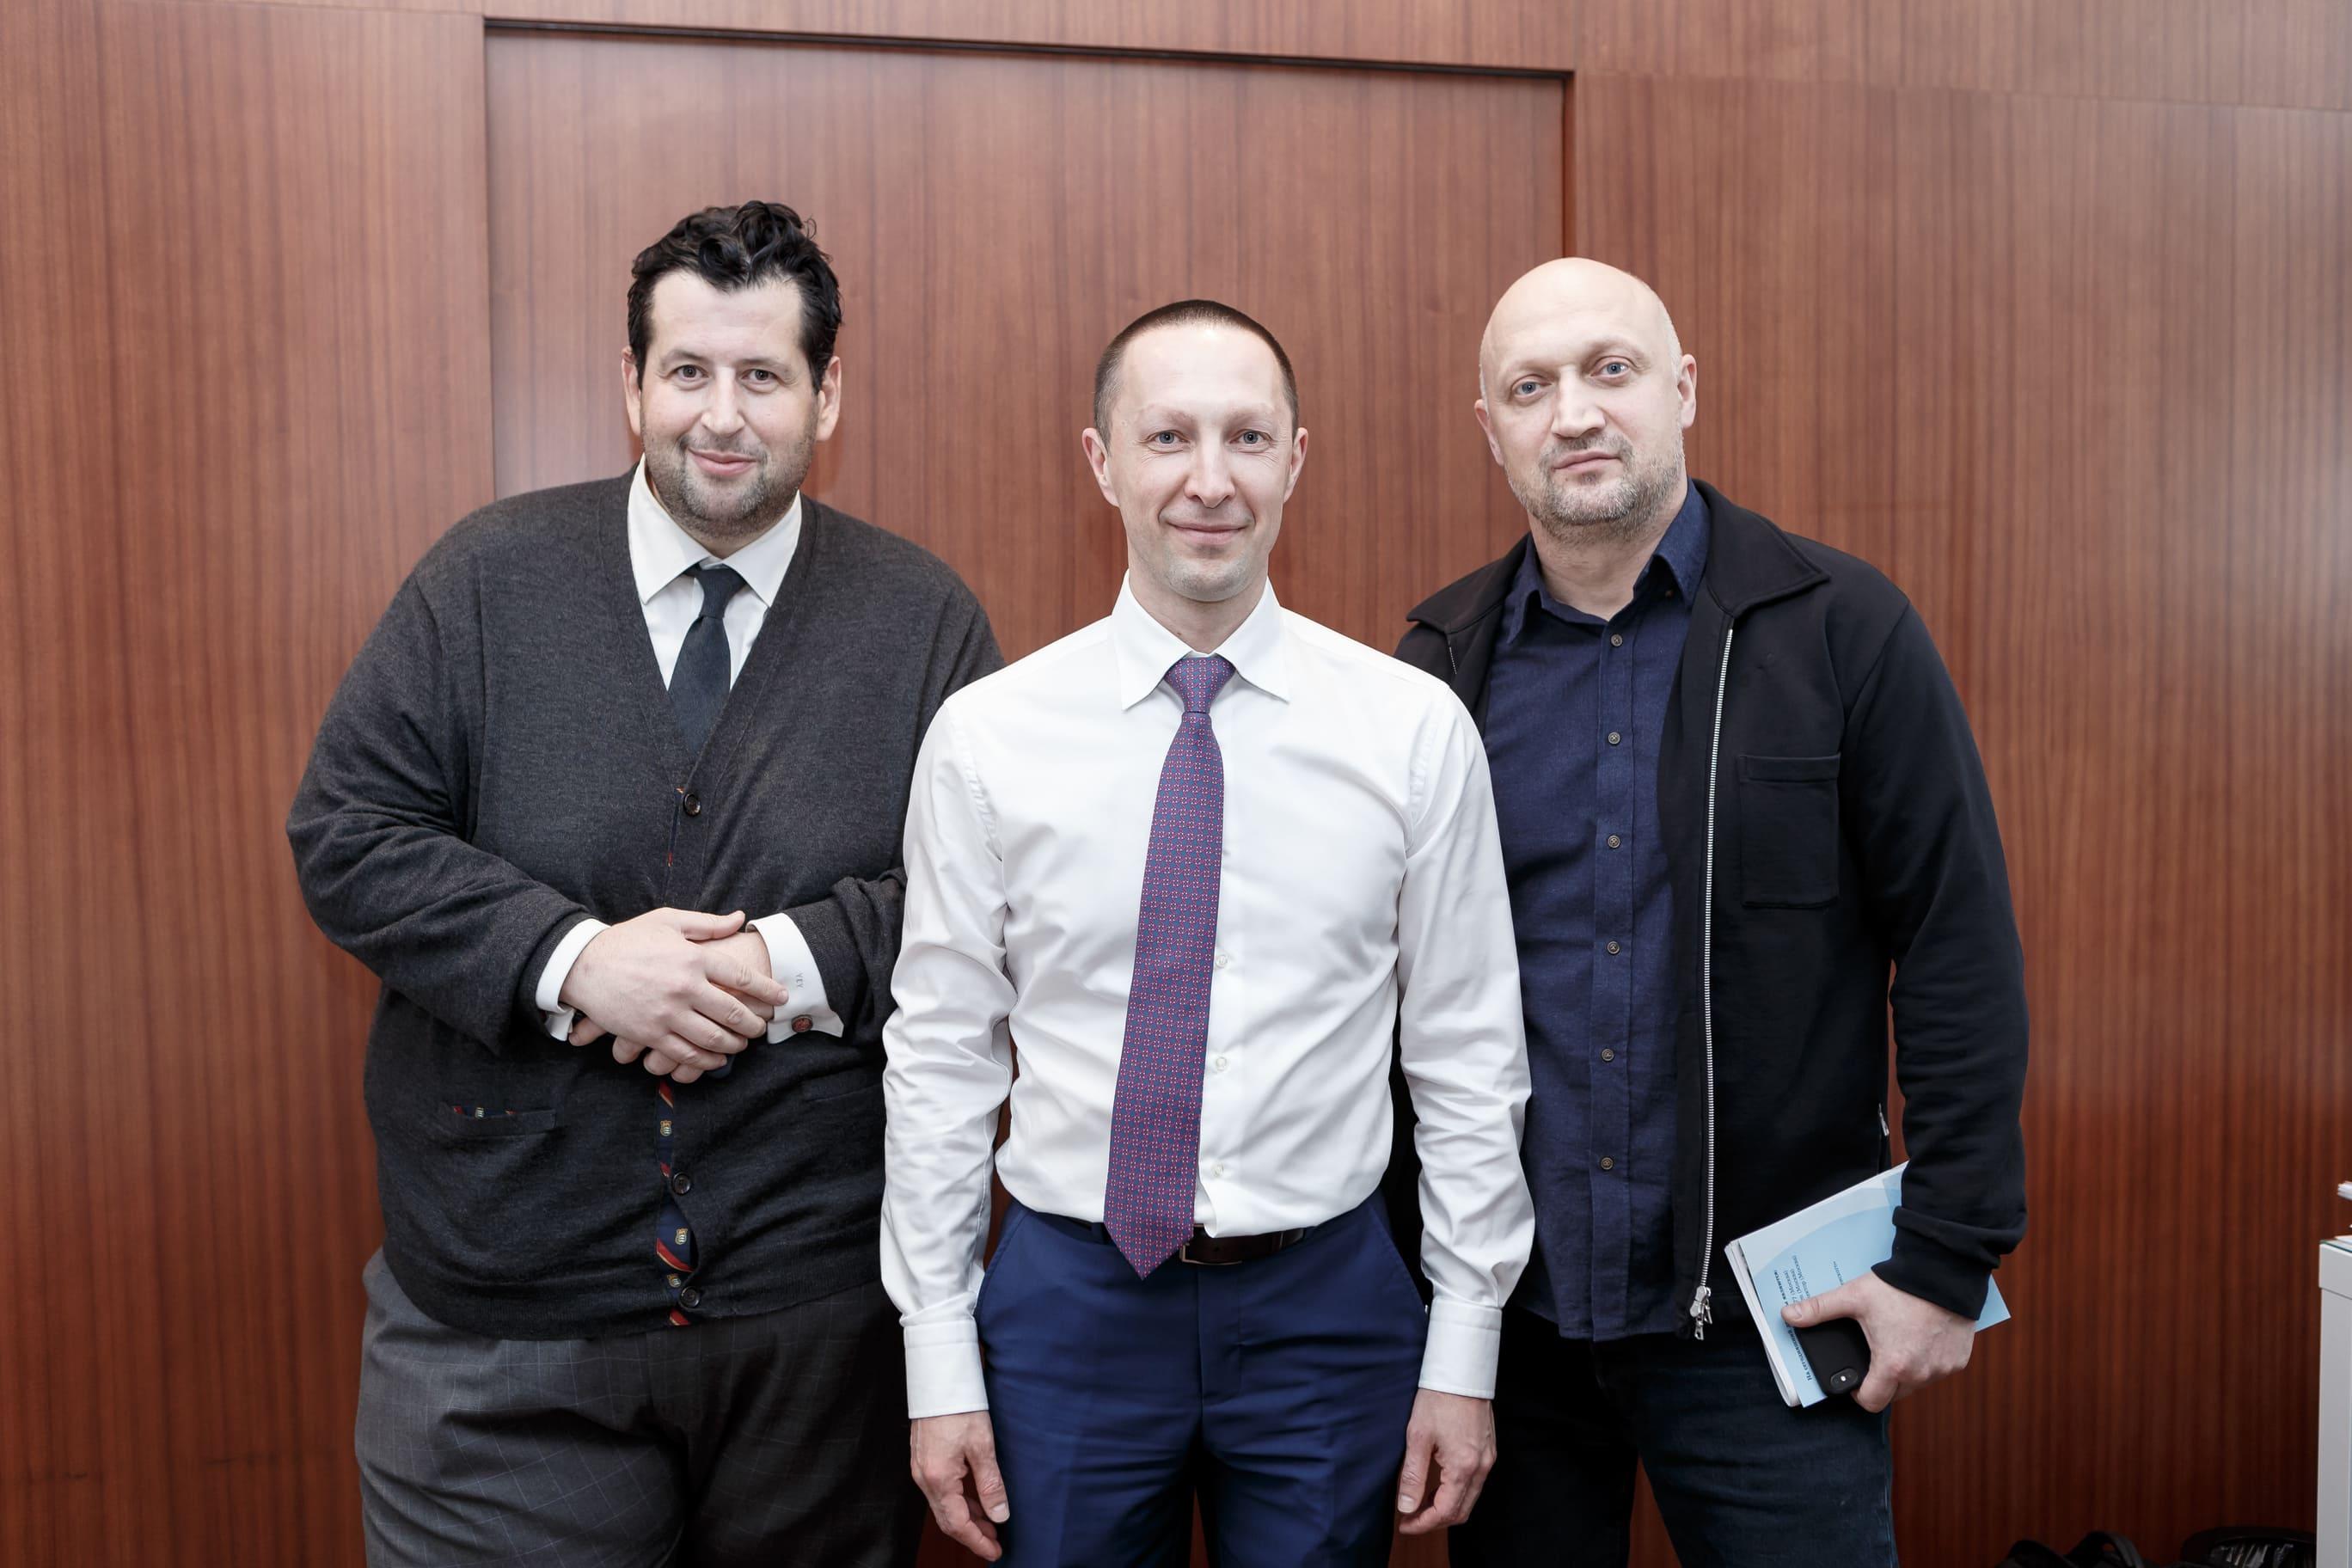 Гоша Куценко, Ян Яновский и Вадим Лобов на Synergy Charity Forum